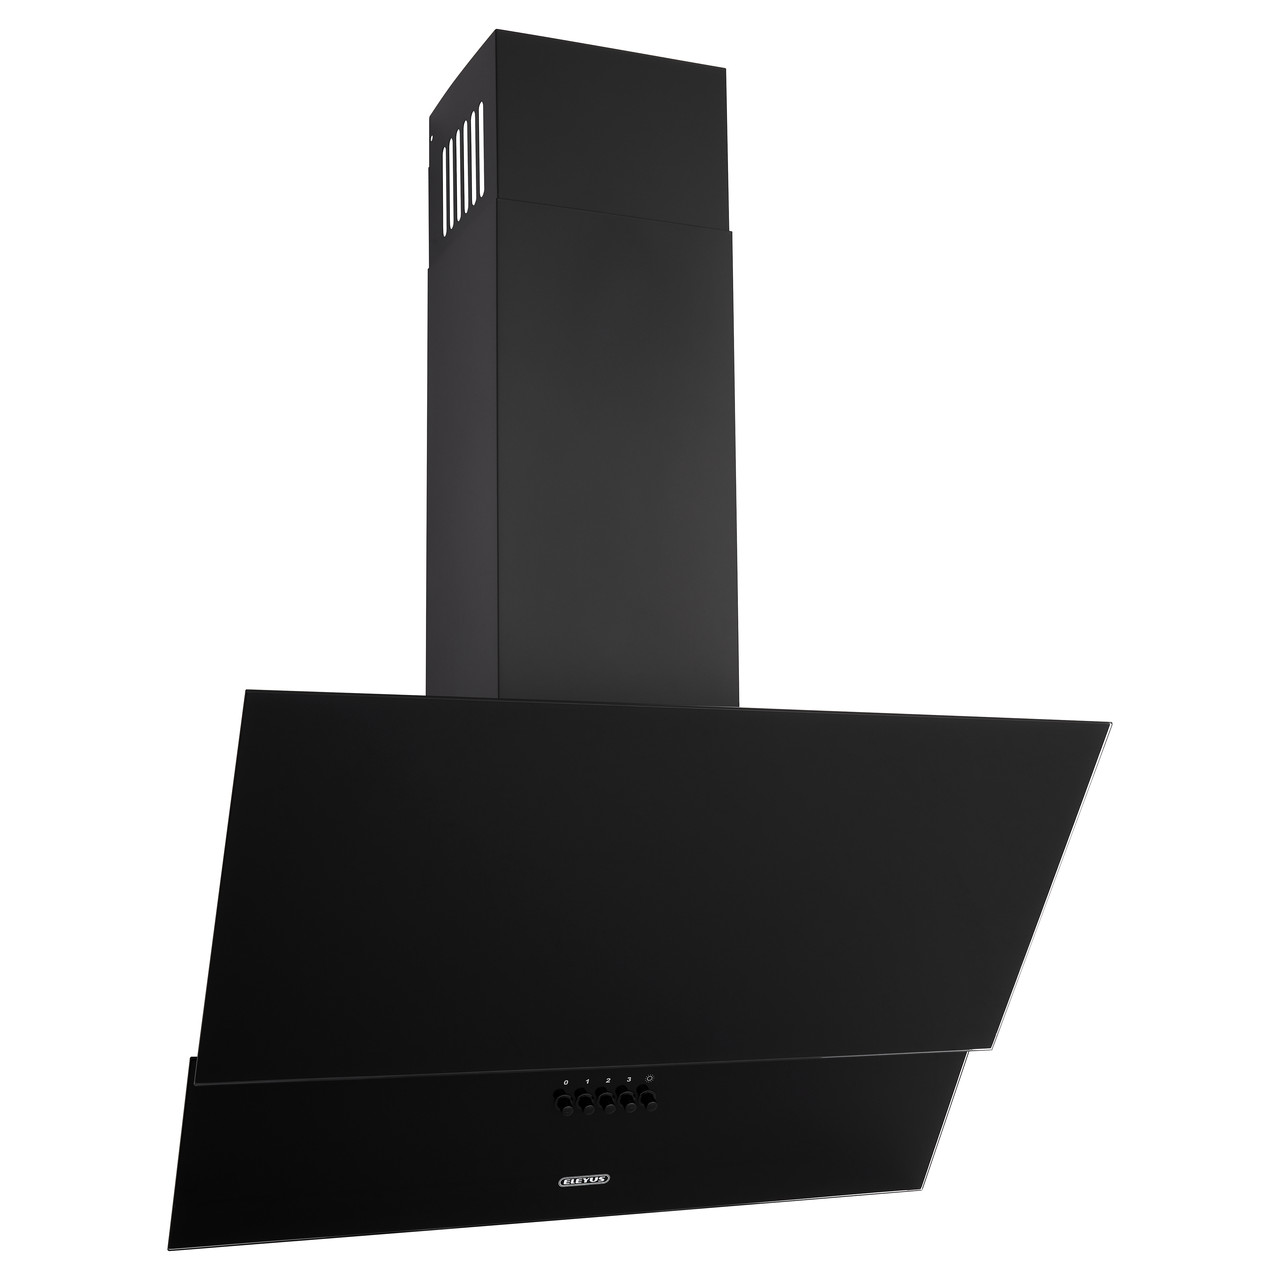 Витяжка кухонна вертикальна ELEYUS Ellada 700 60 BL (чорна)